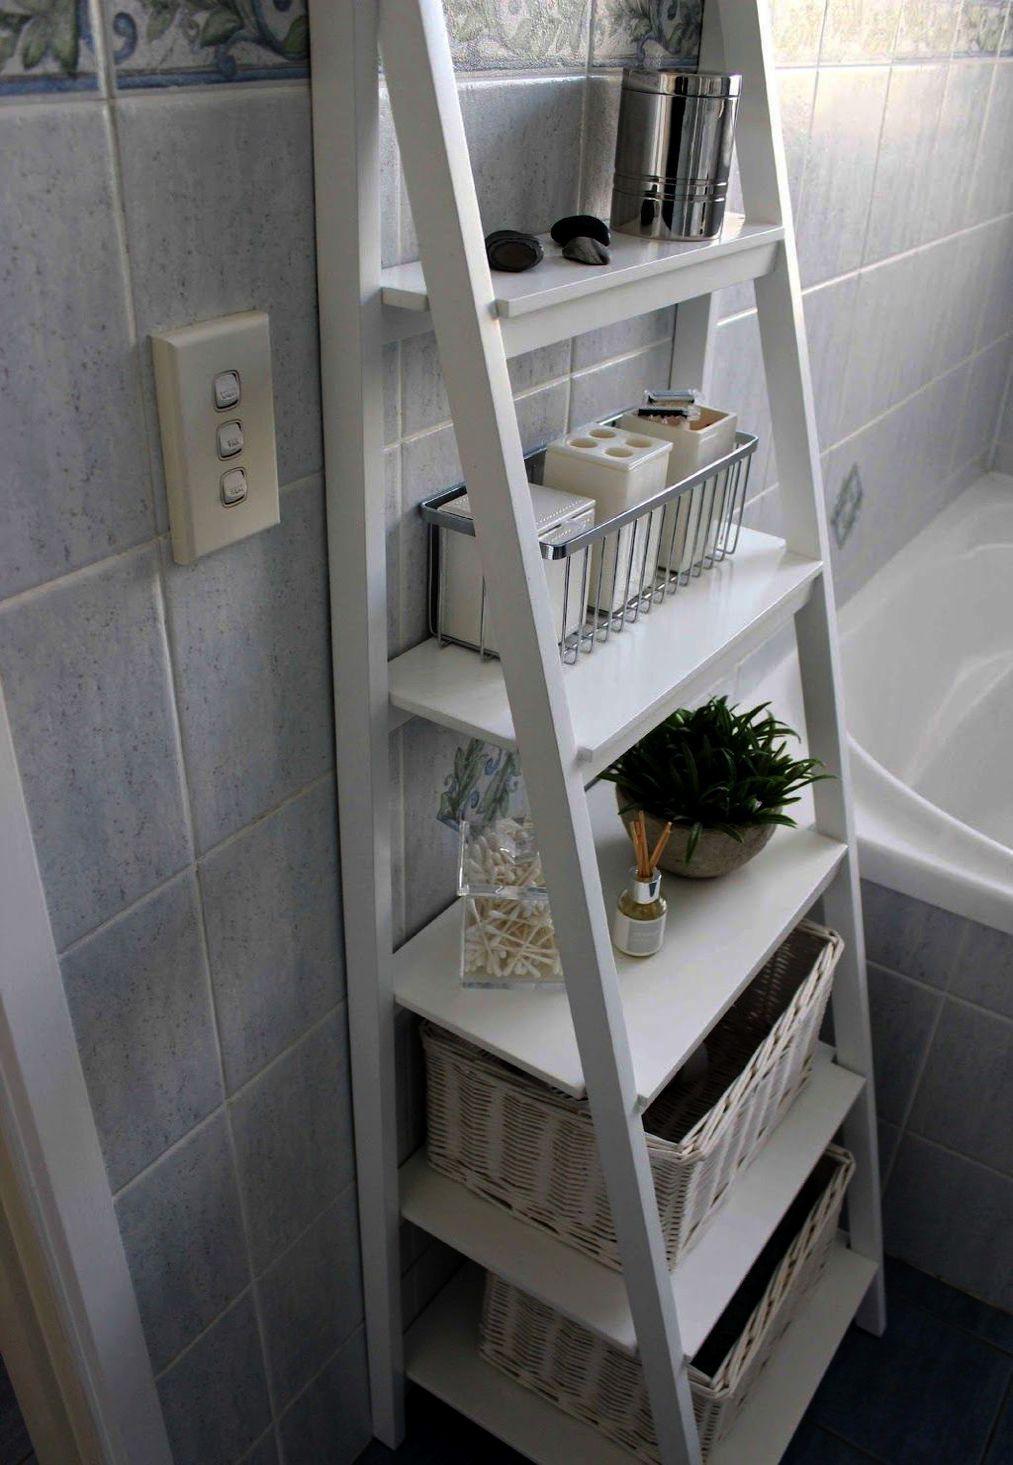 Mdesign Free Standing Bathroom Storage Shelves For Towels Soap